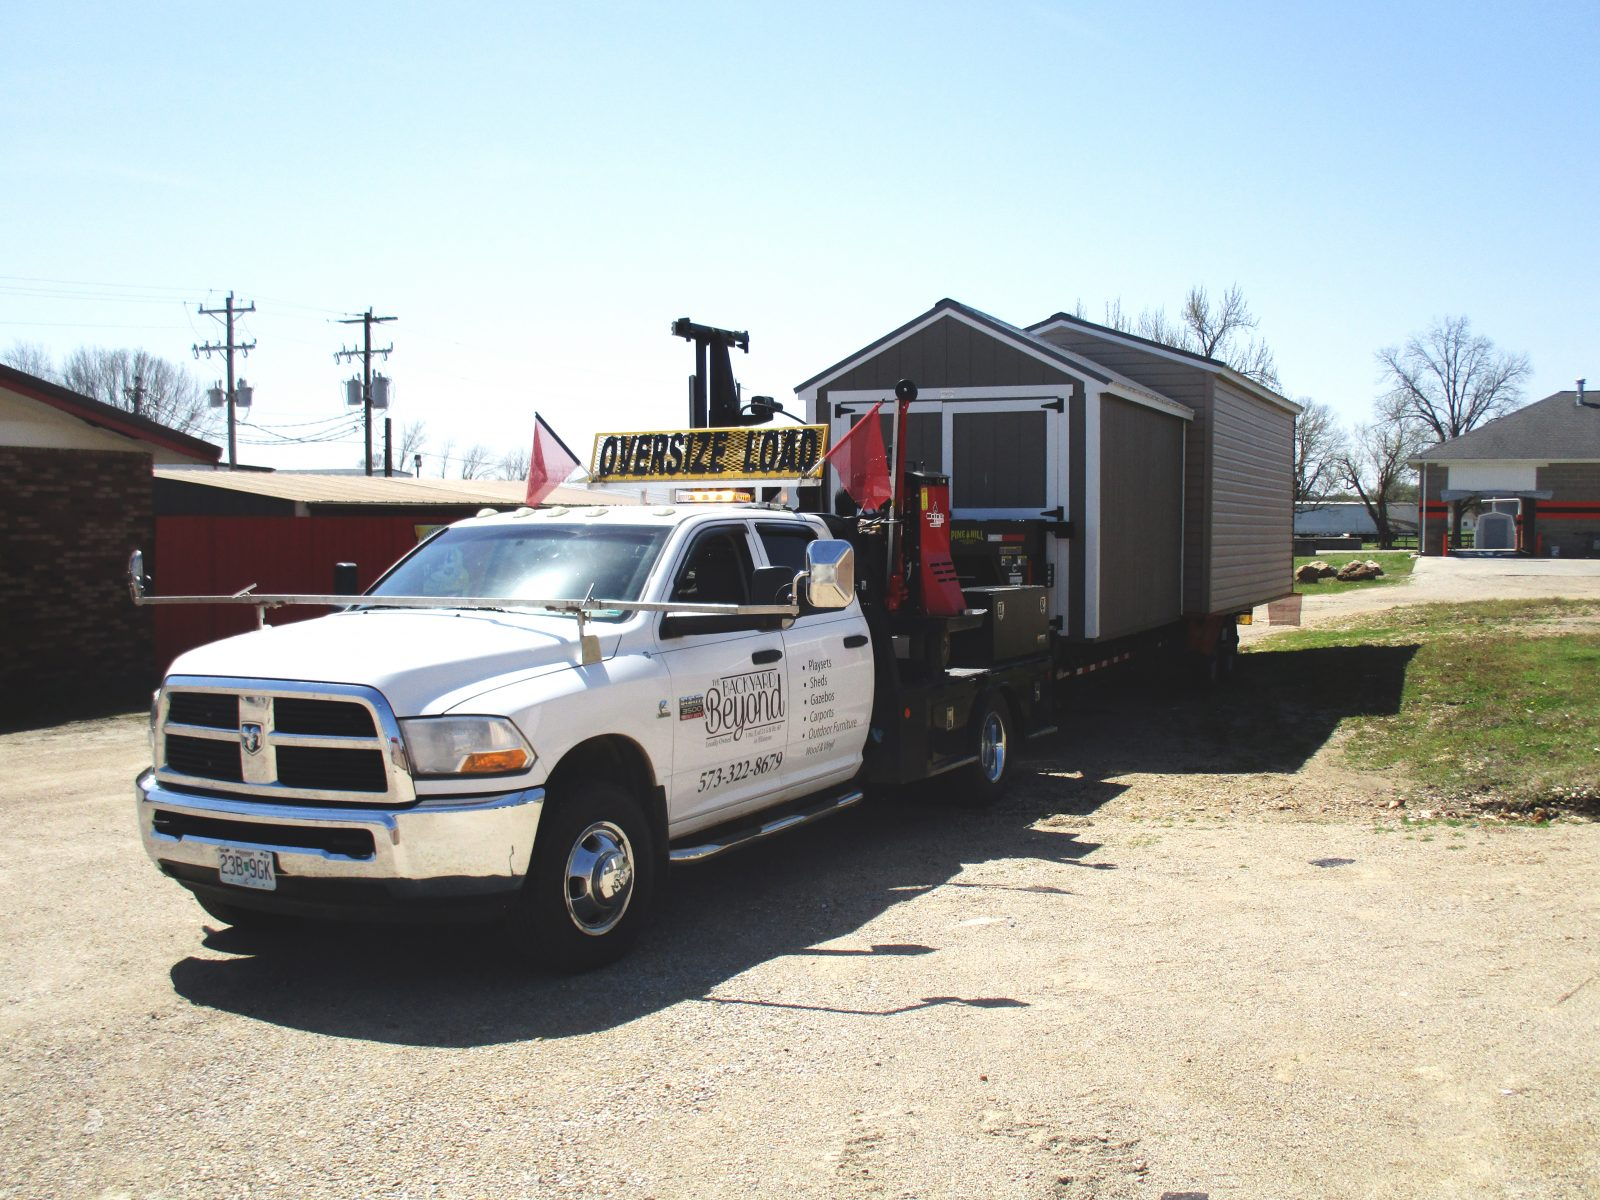 10x20 portable garage delivery